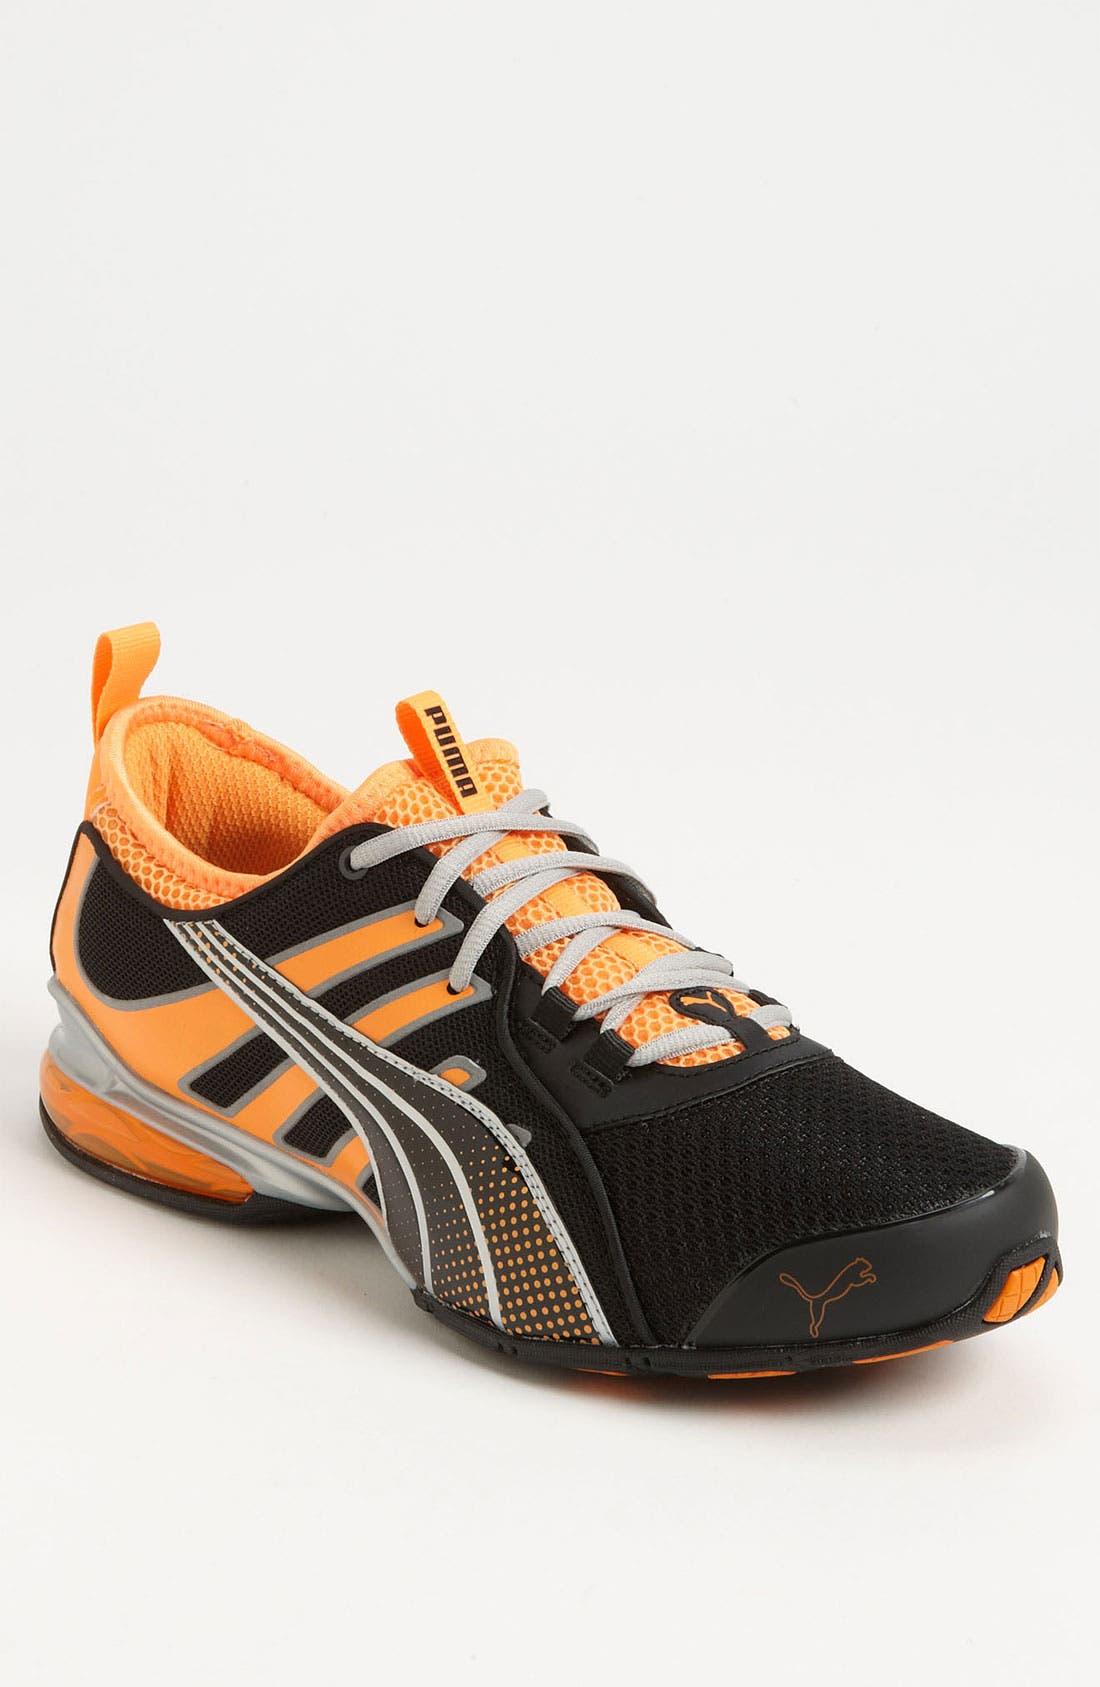 PUMA 'Voltaic 4 M' Training Shoe, Main, color, 001